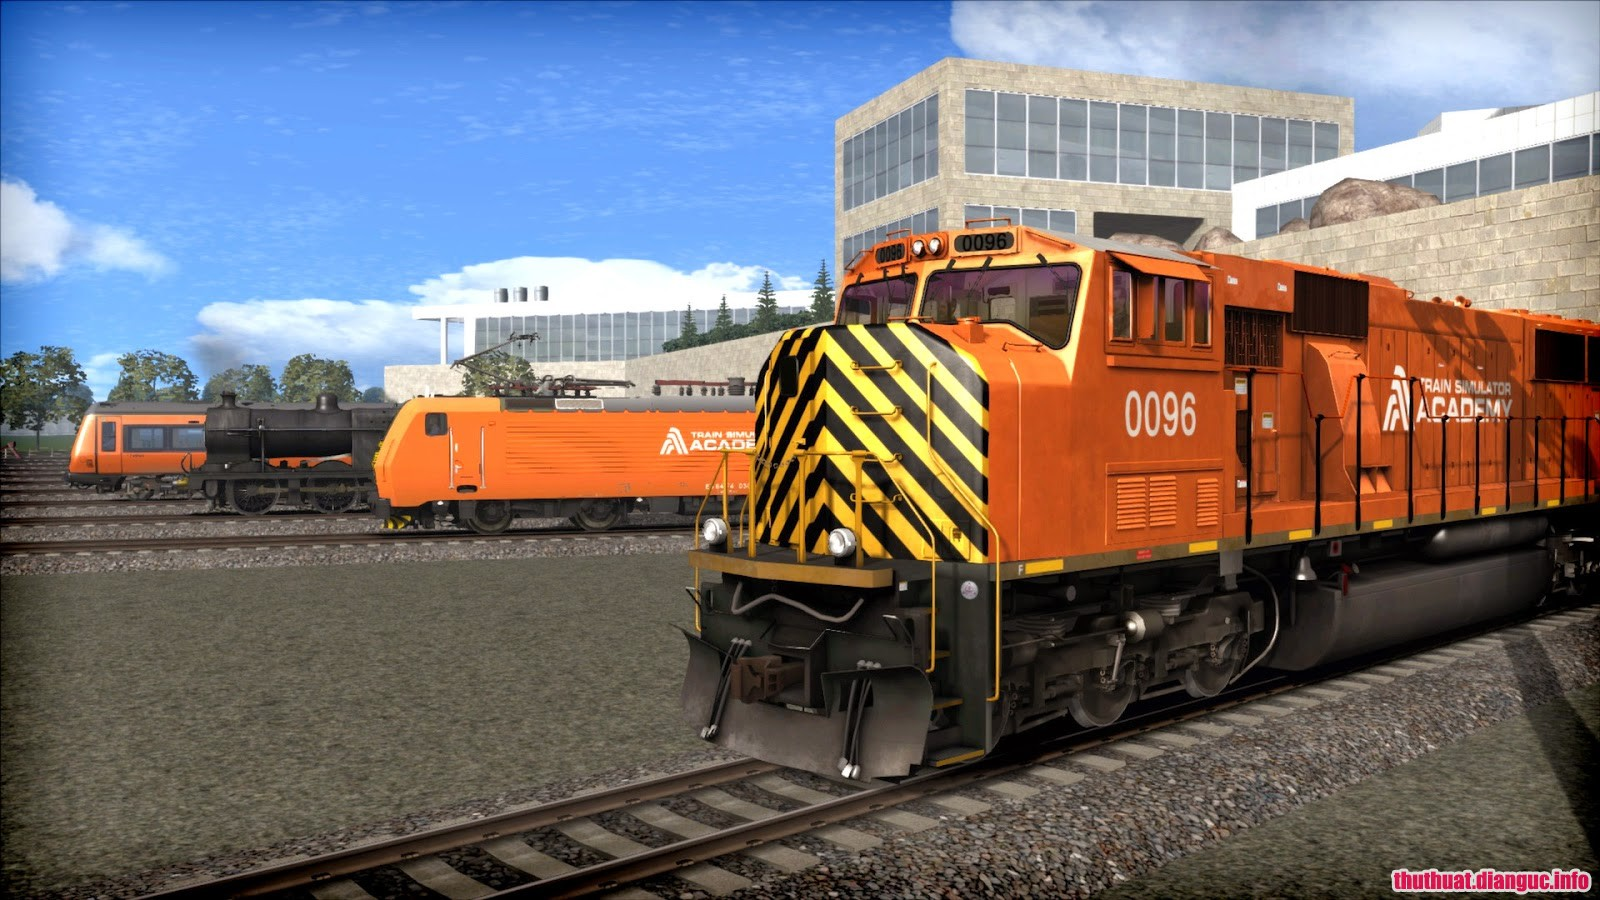 Tải game Train Simulator 2015 miễn phí,